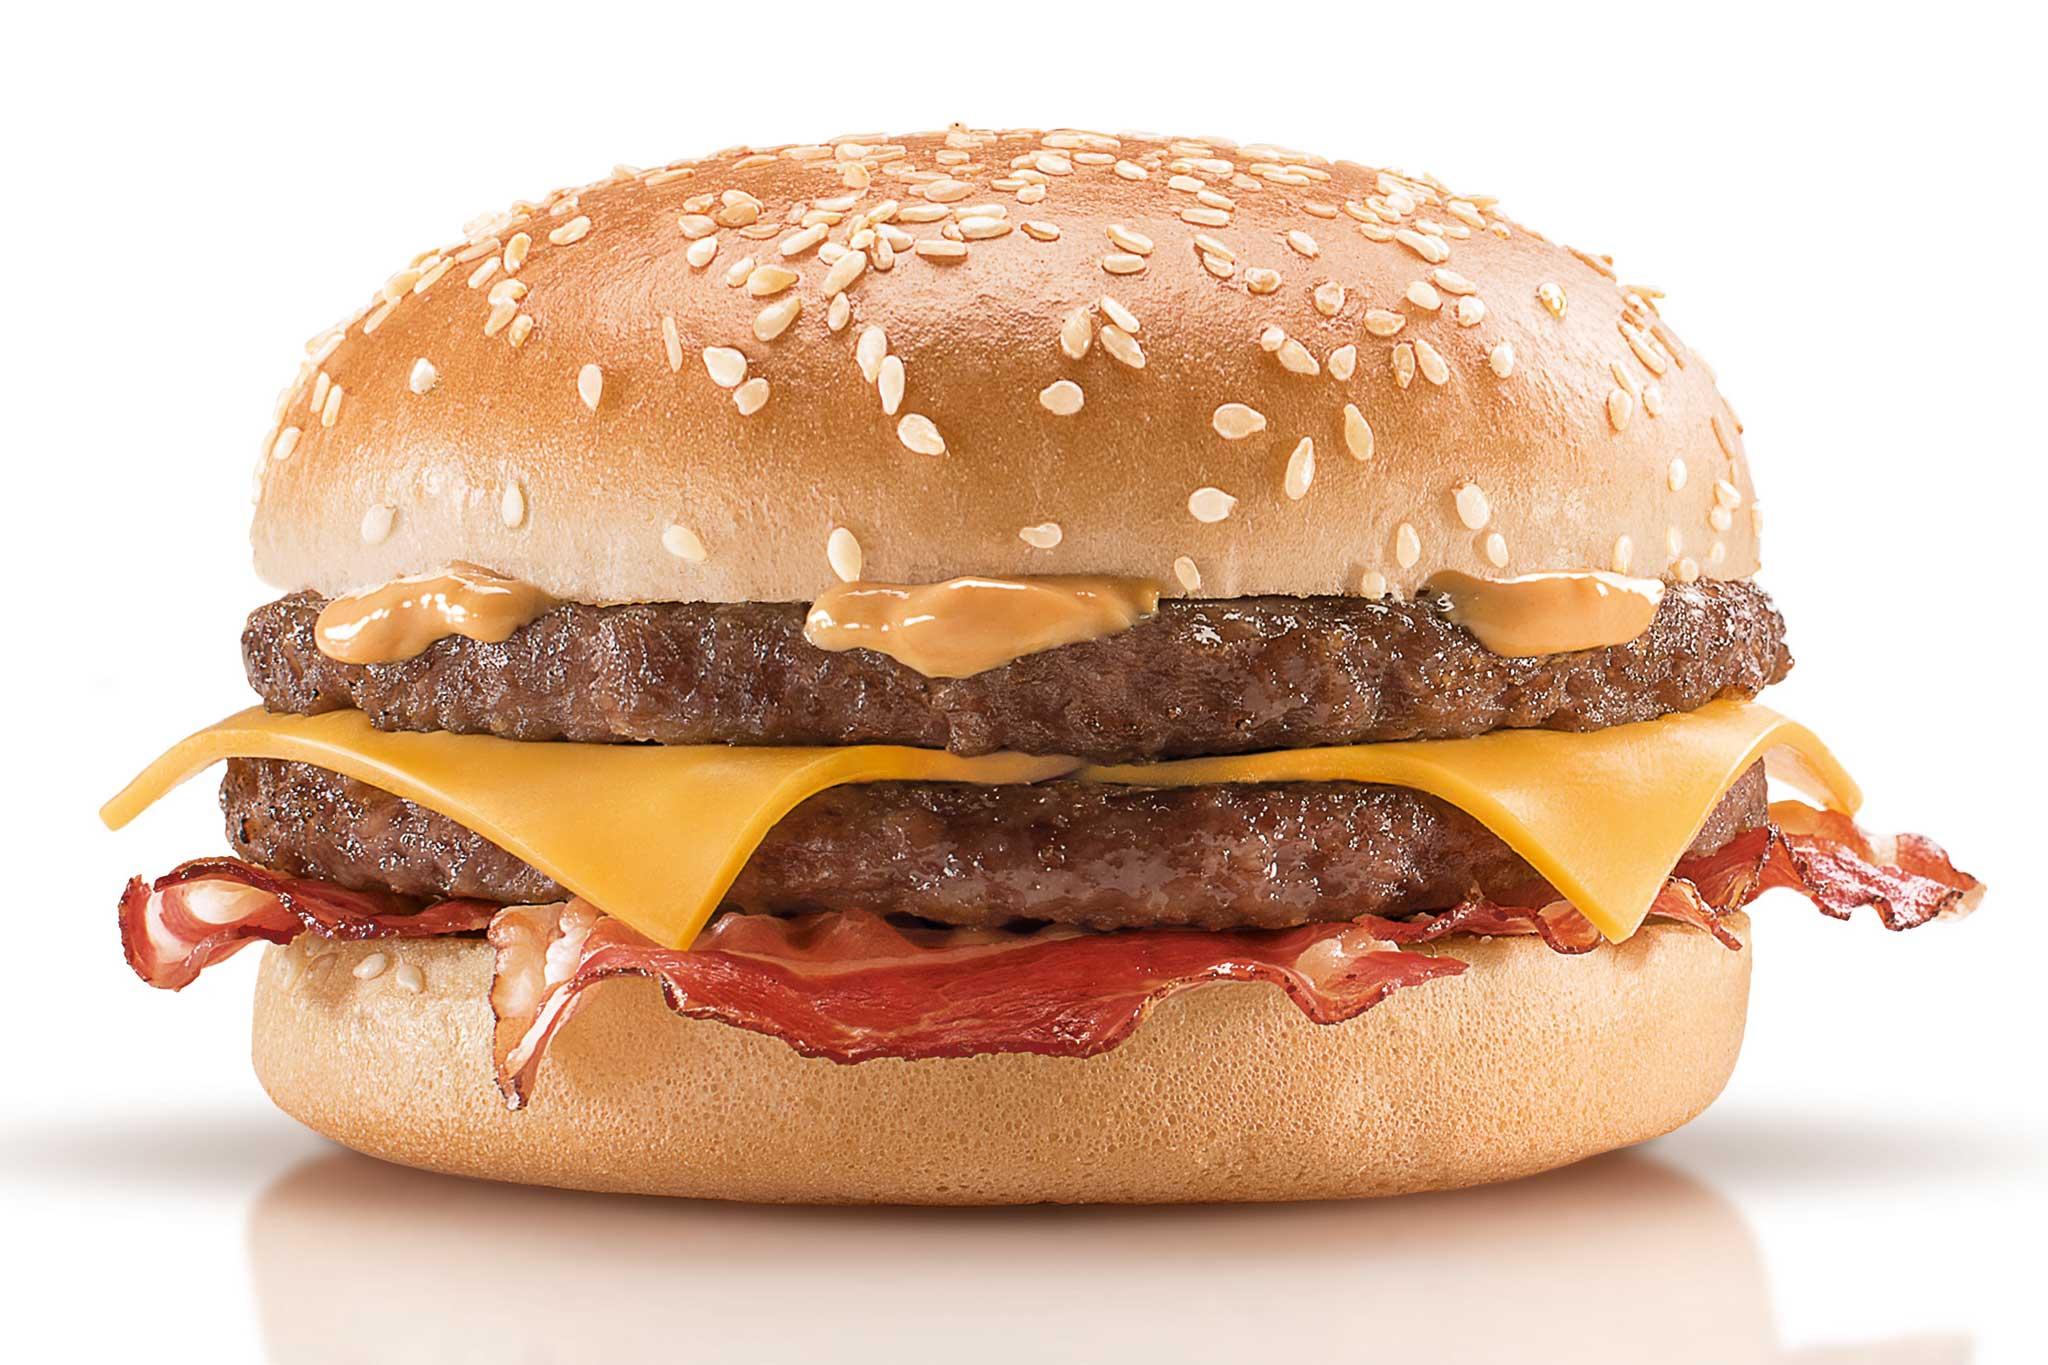 Hamburger crispy mcbacon con salsa